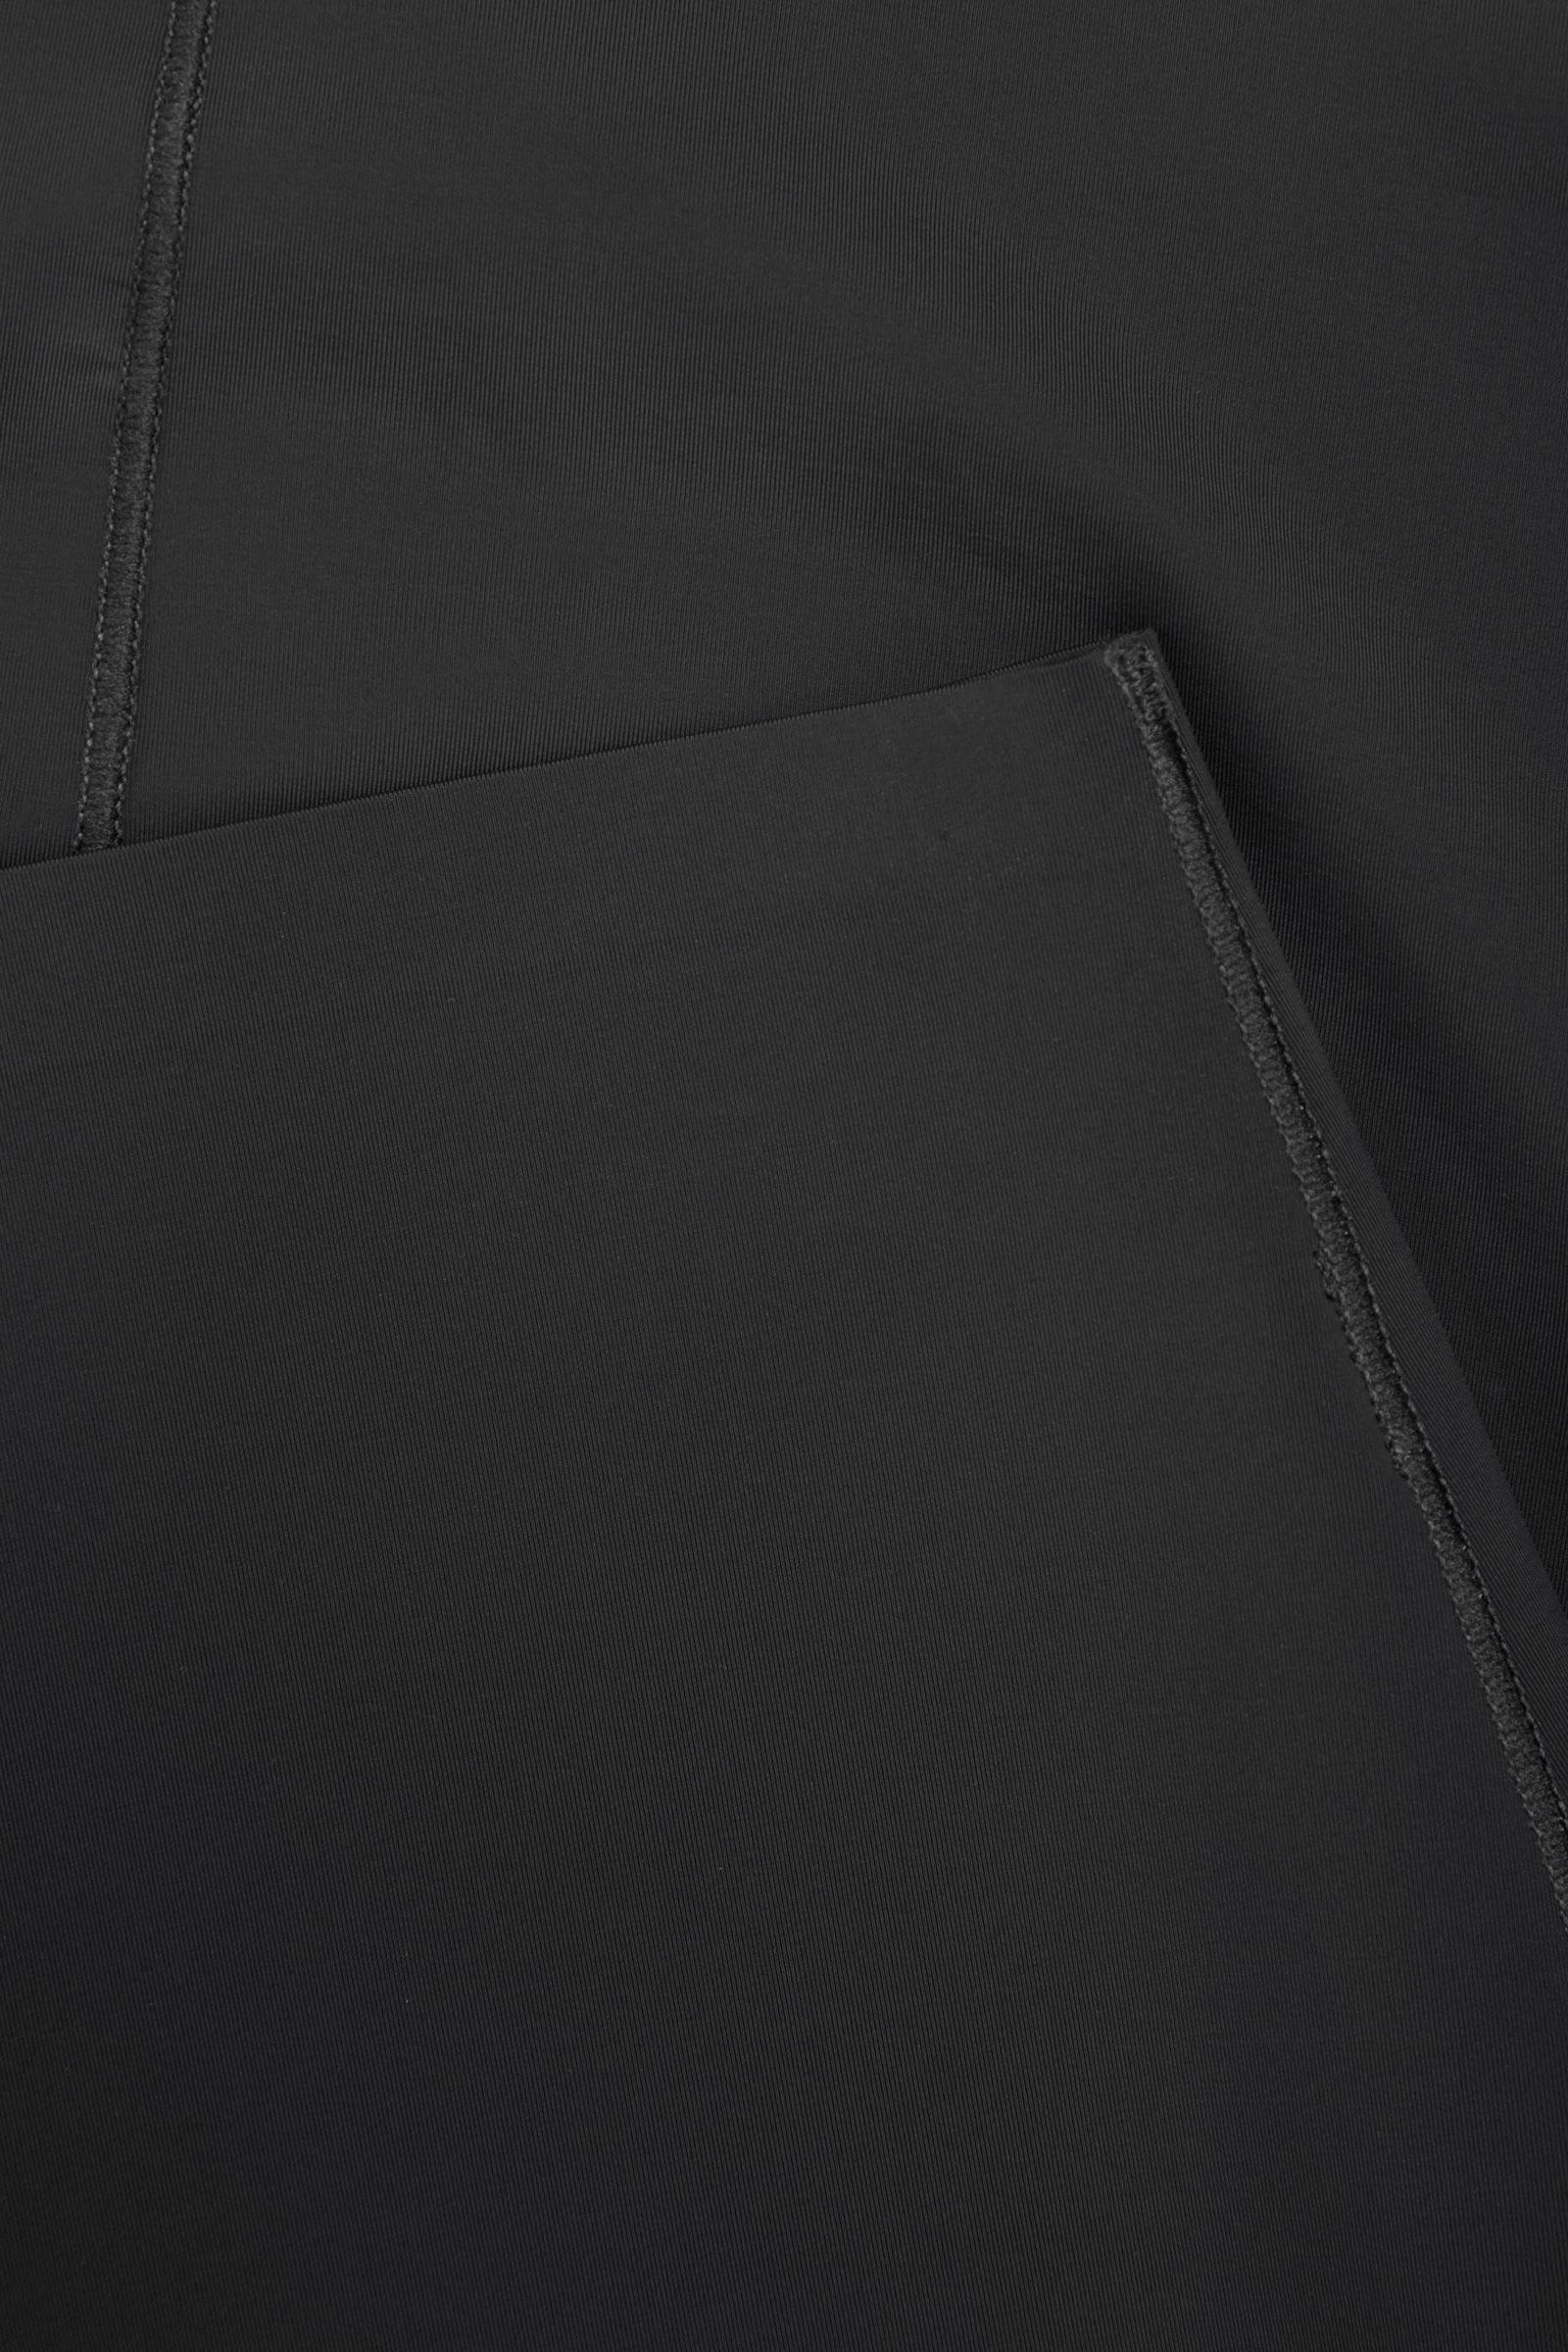 COS 리사이클 나일론 언더스커트의 블랙컬러 Detail입니다.